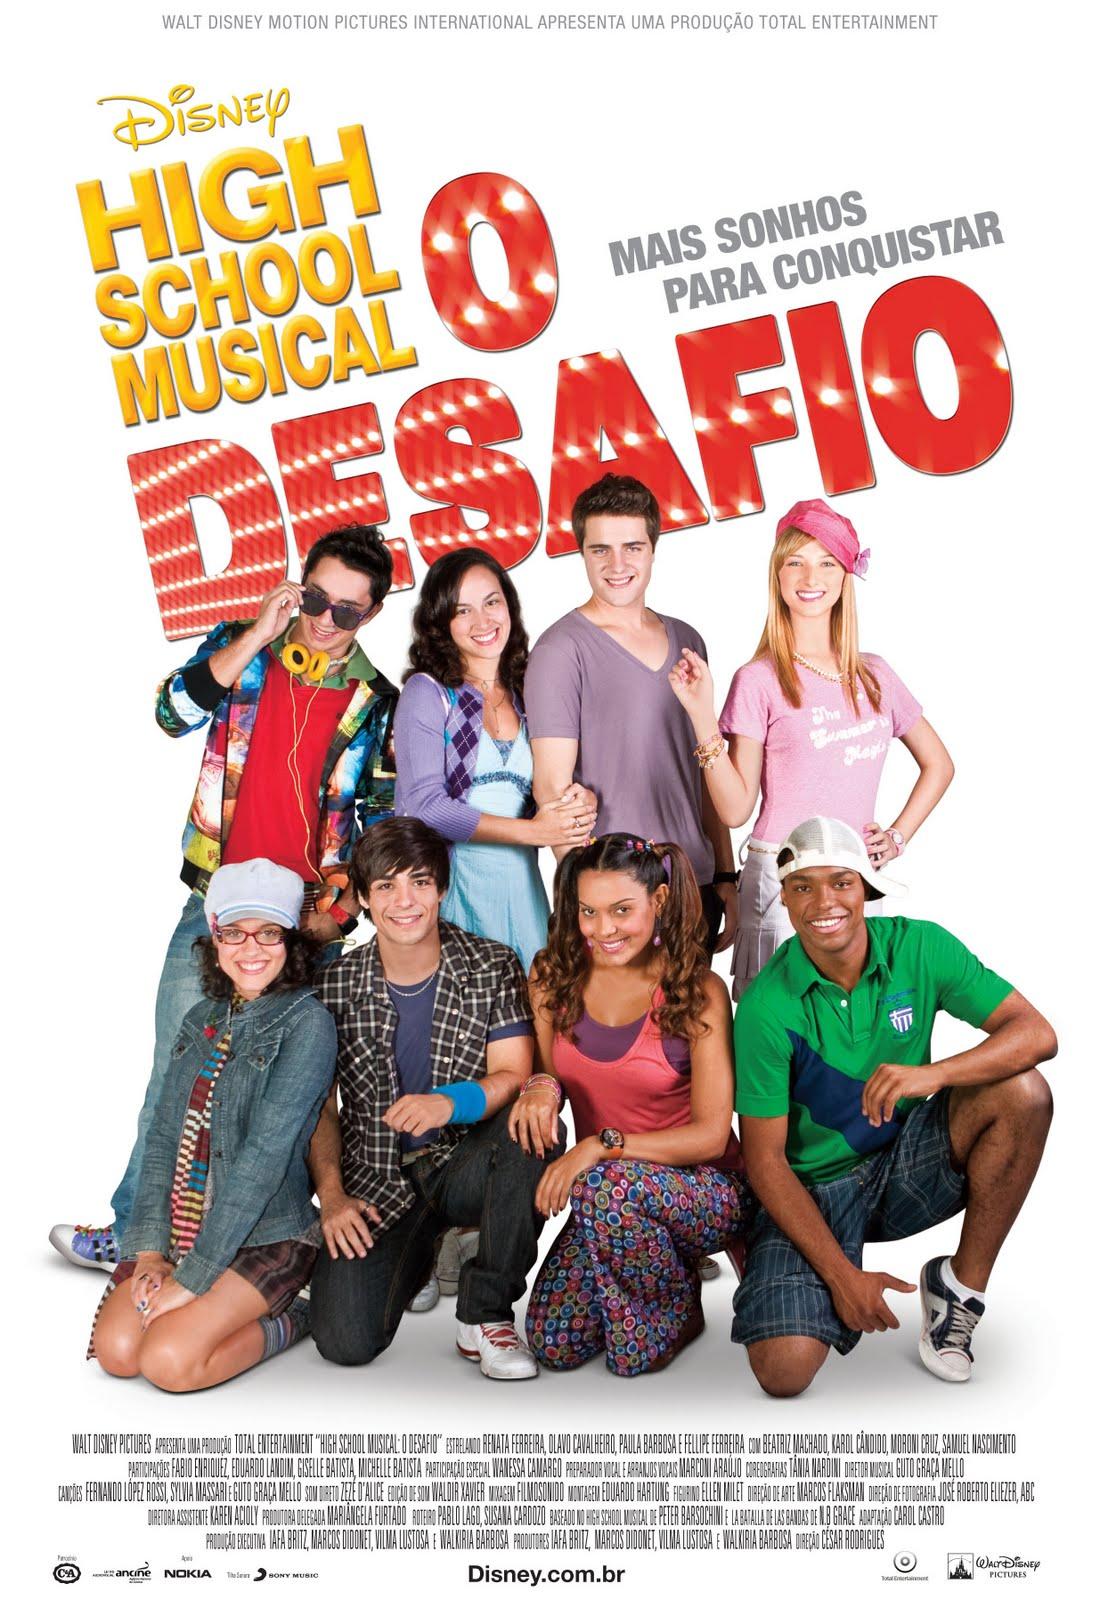 musica high school music: